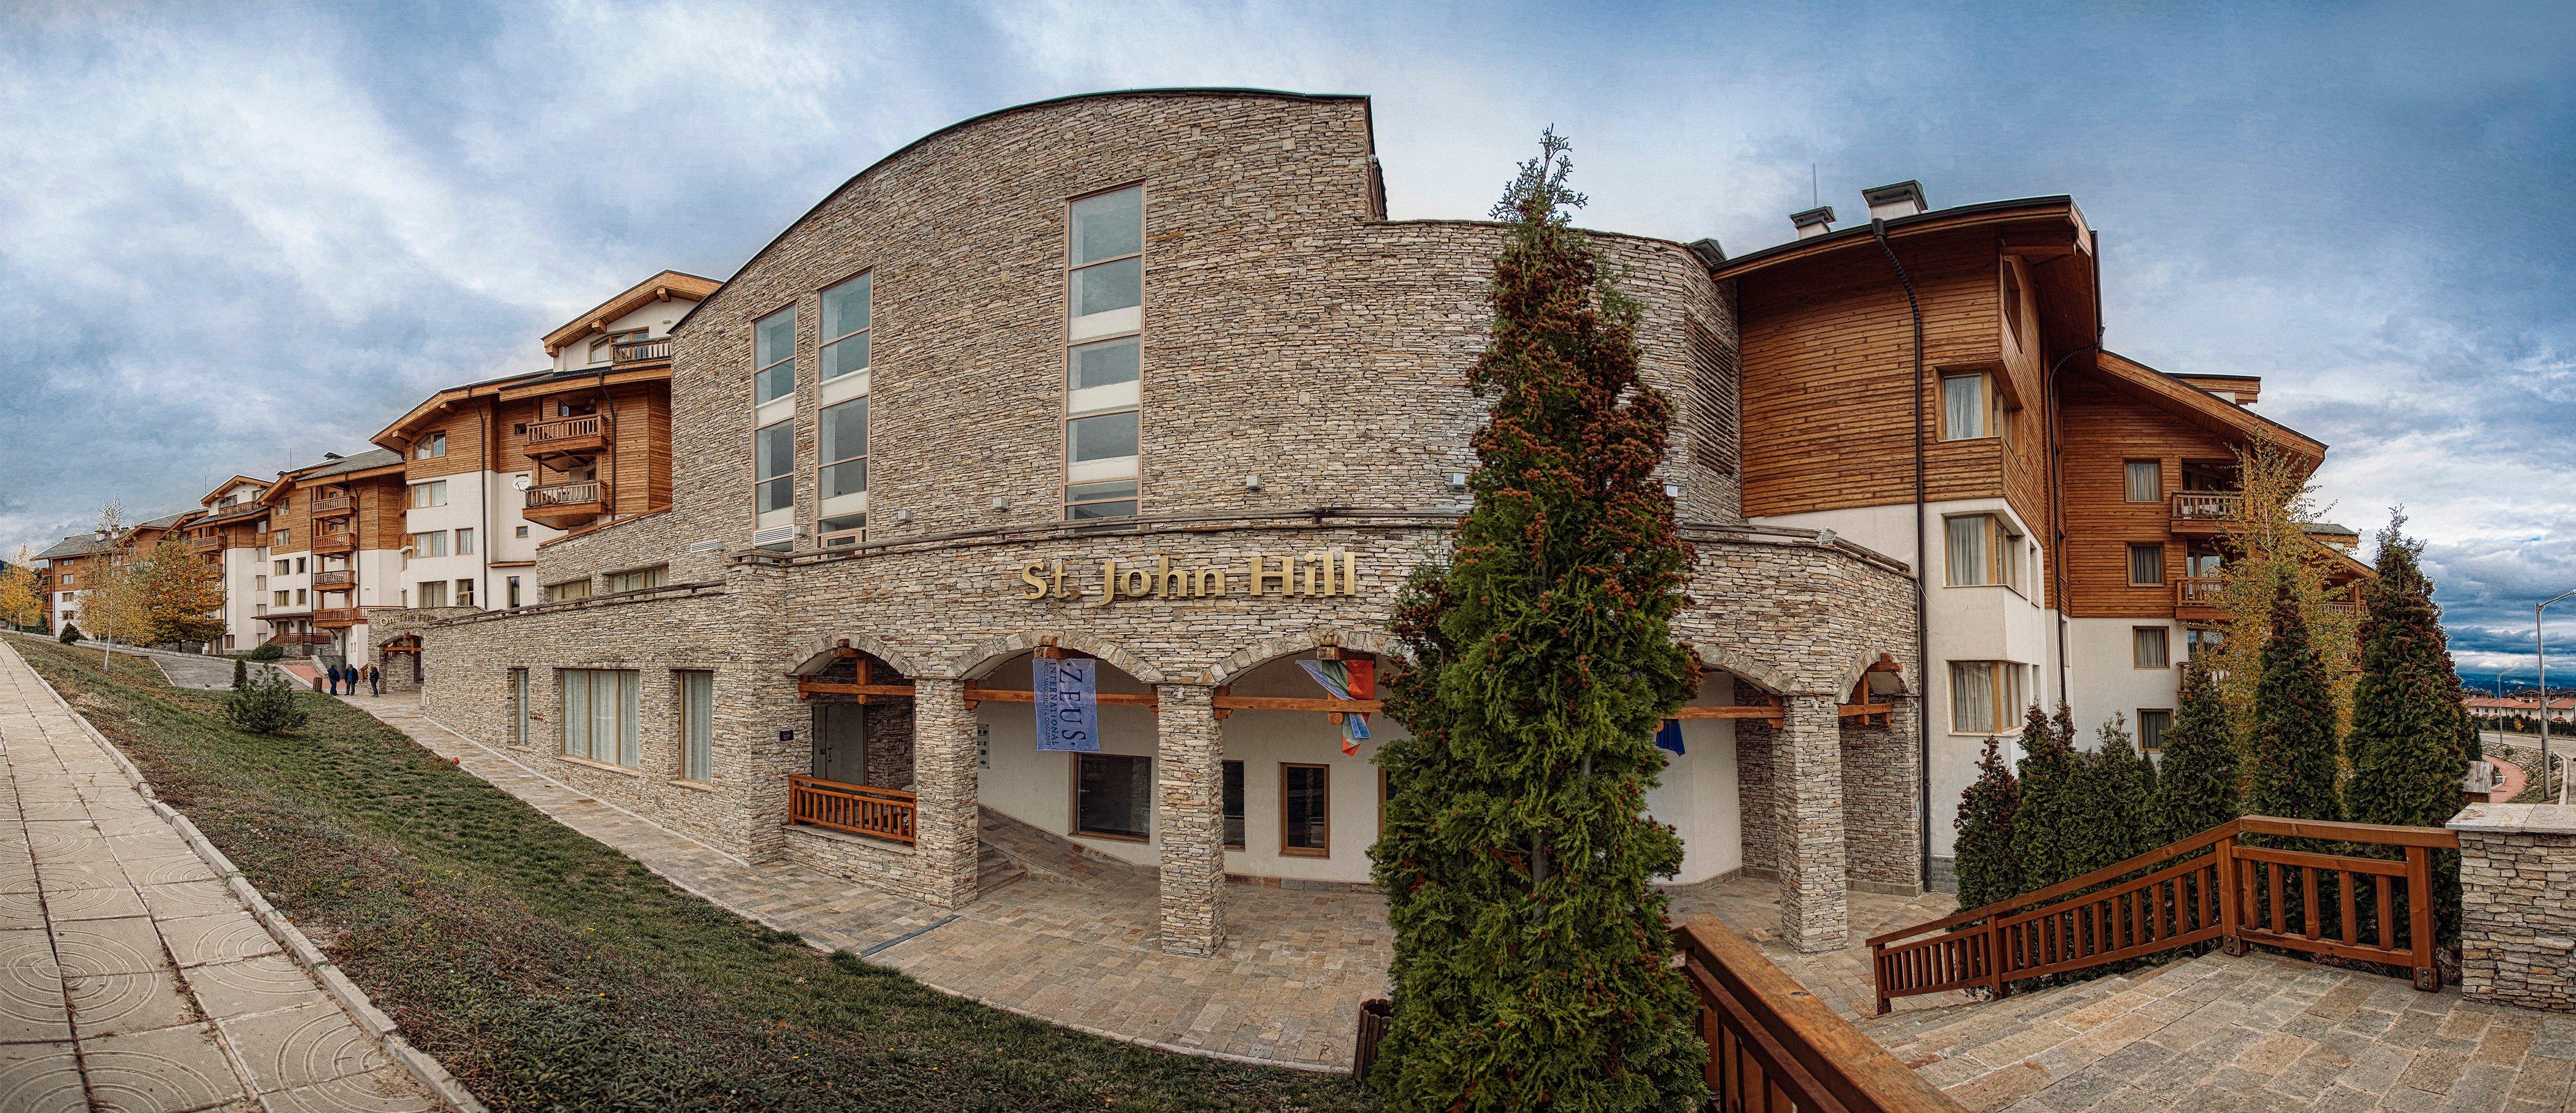 St. John Hill Bansko Ski & Spa Resort